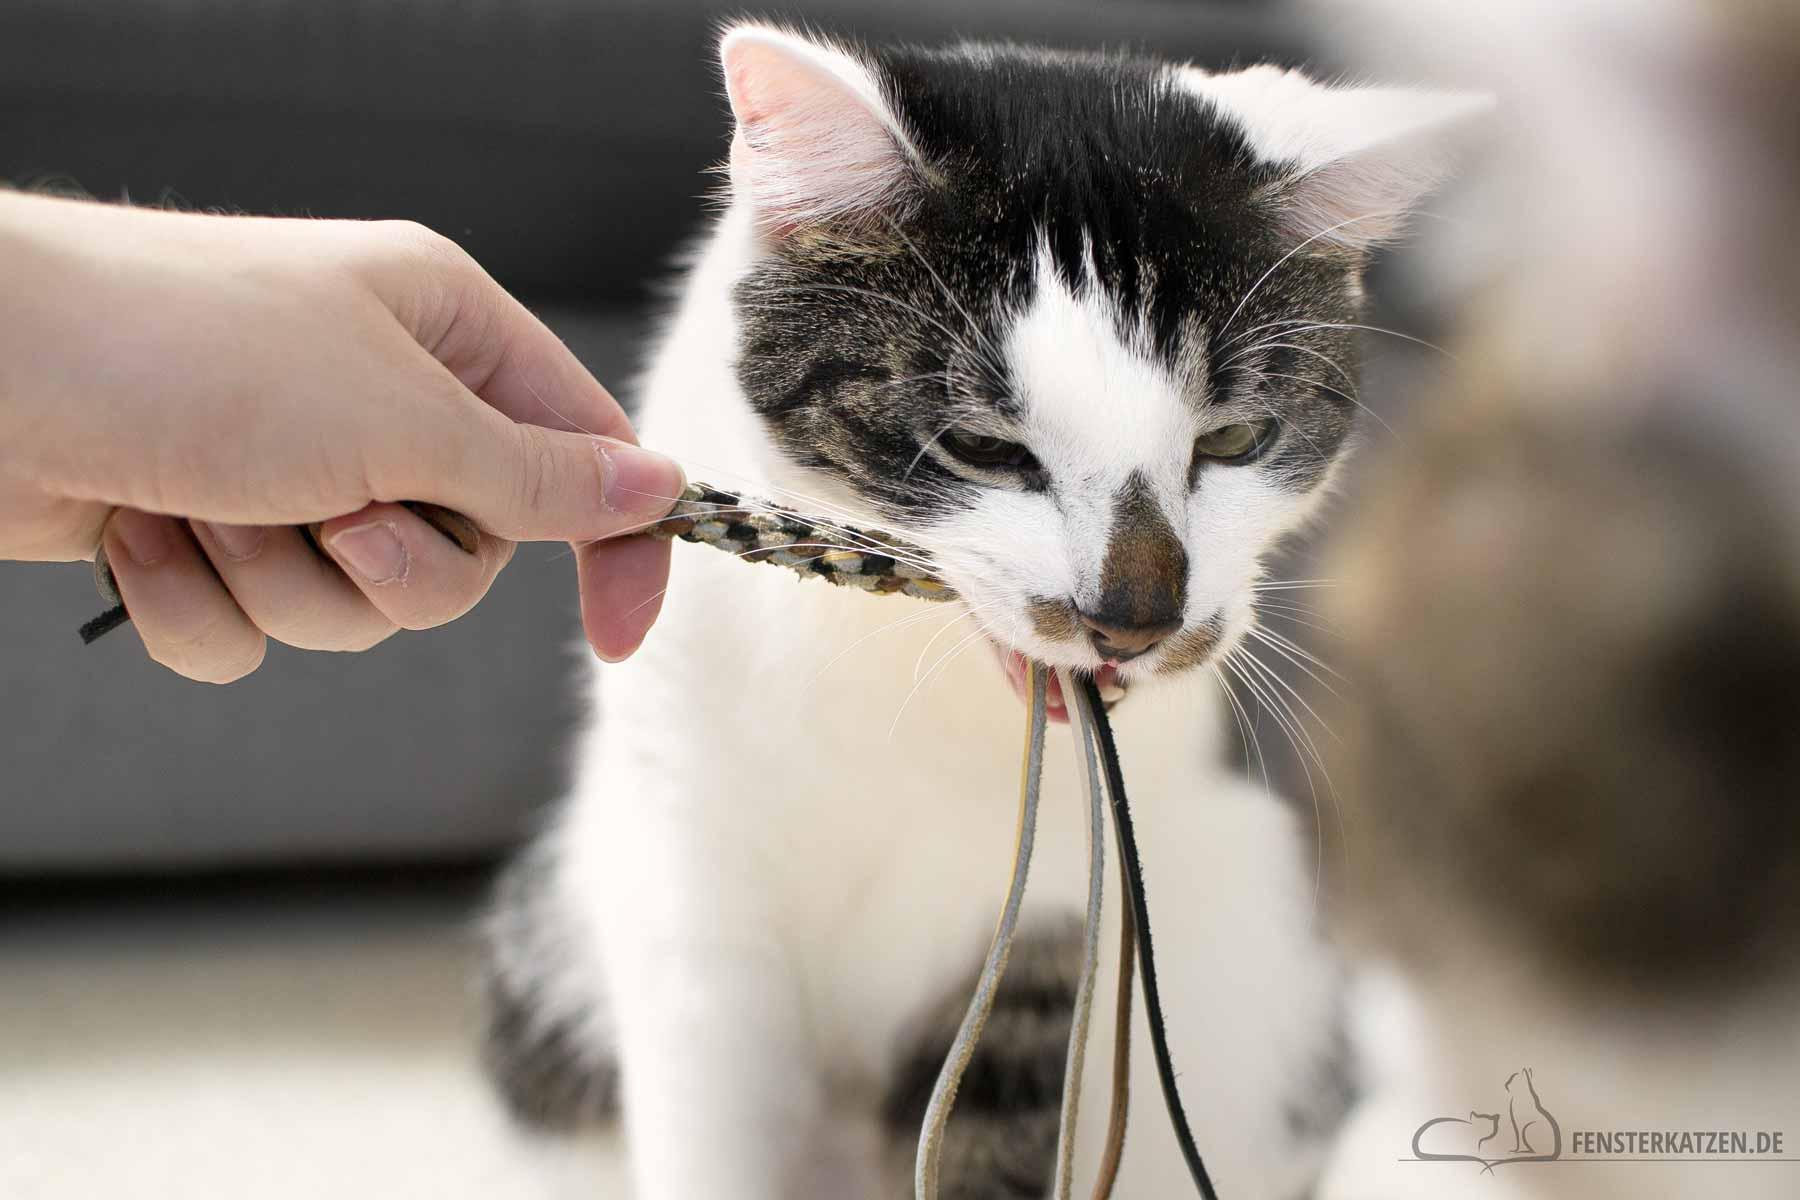 Fensterkatzen-DIY-Kauspielzeug-aus-Lederbaendern-Katzen-Titelbild